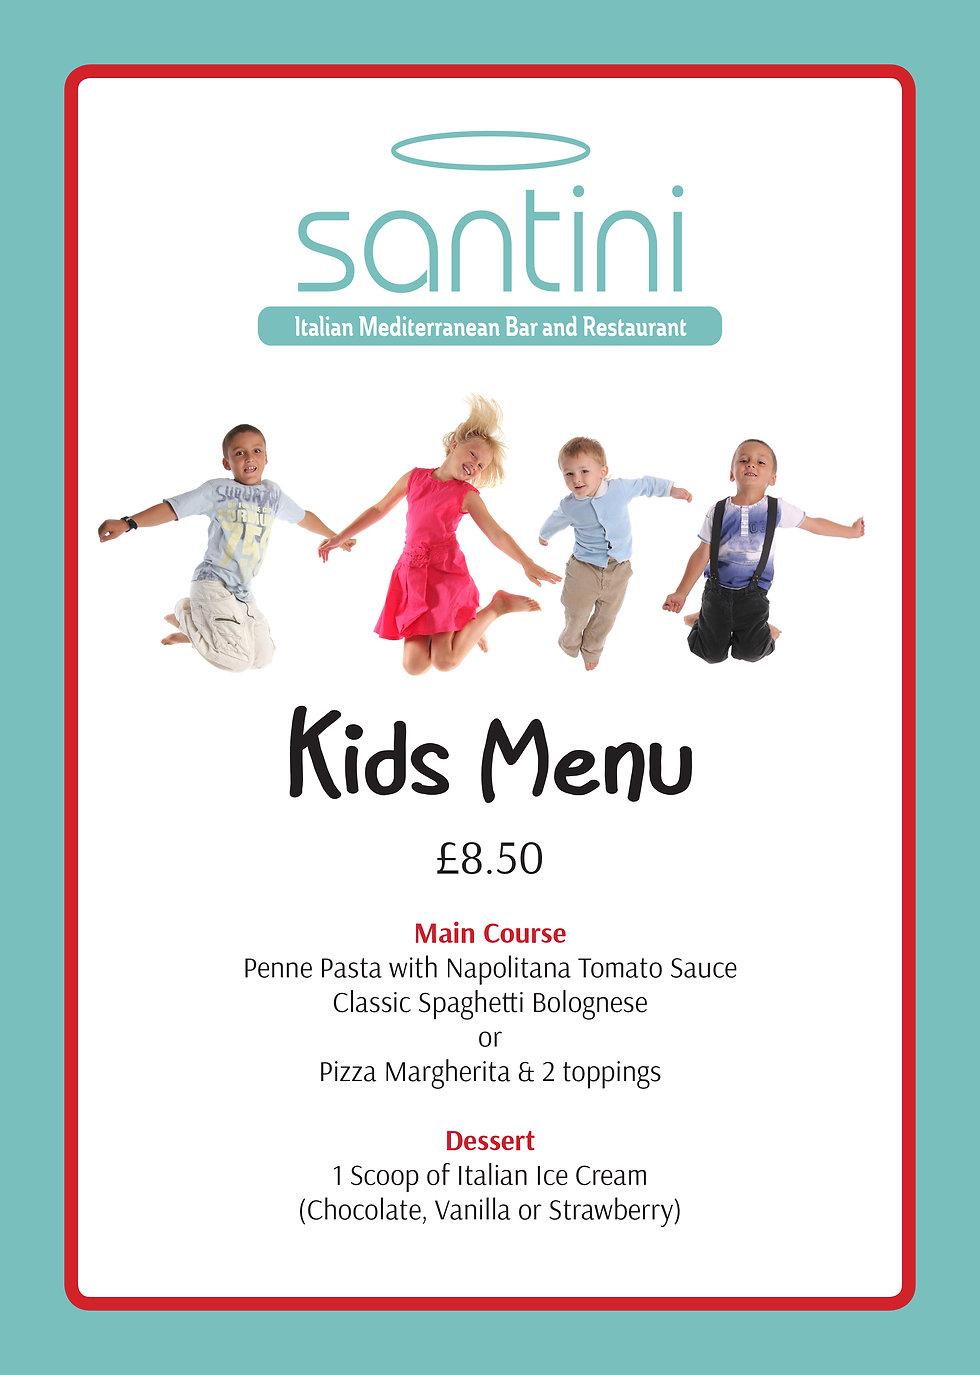 A4 Santini Kids Menu.jpg